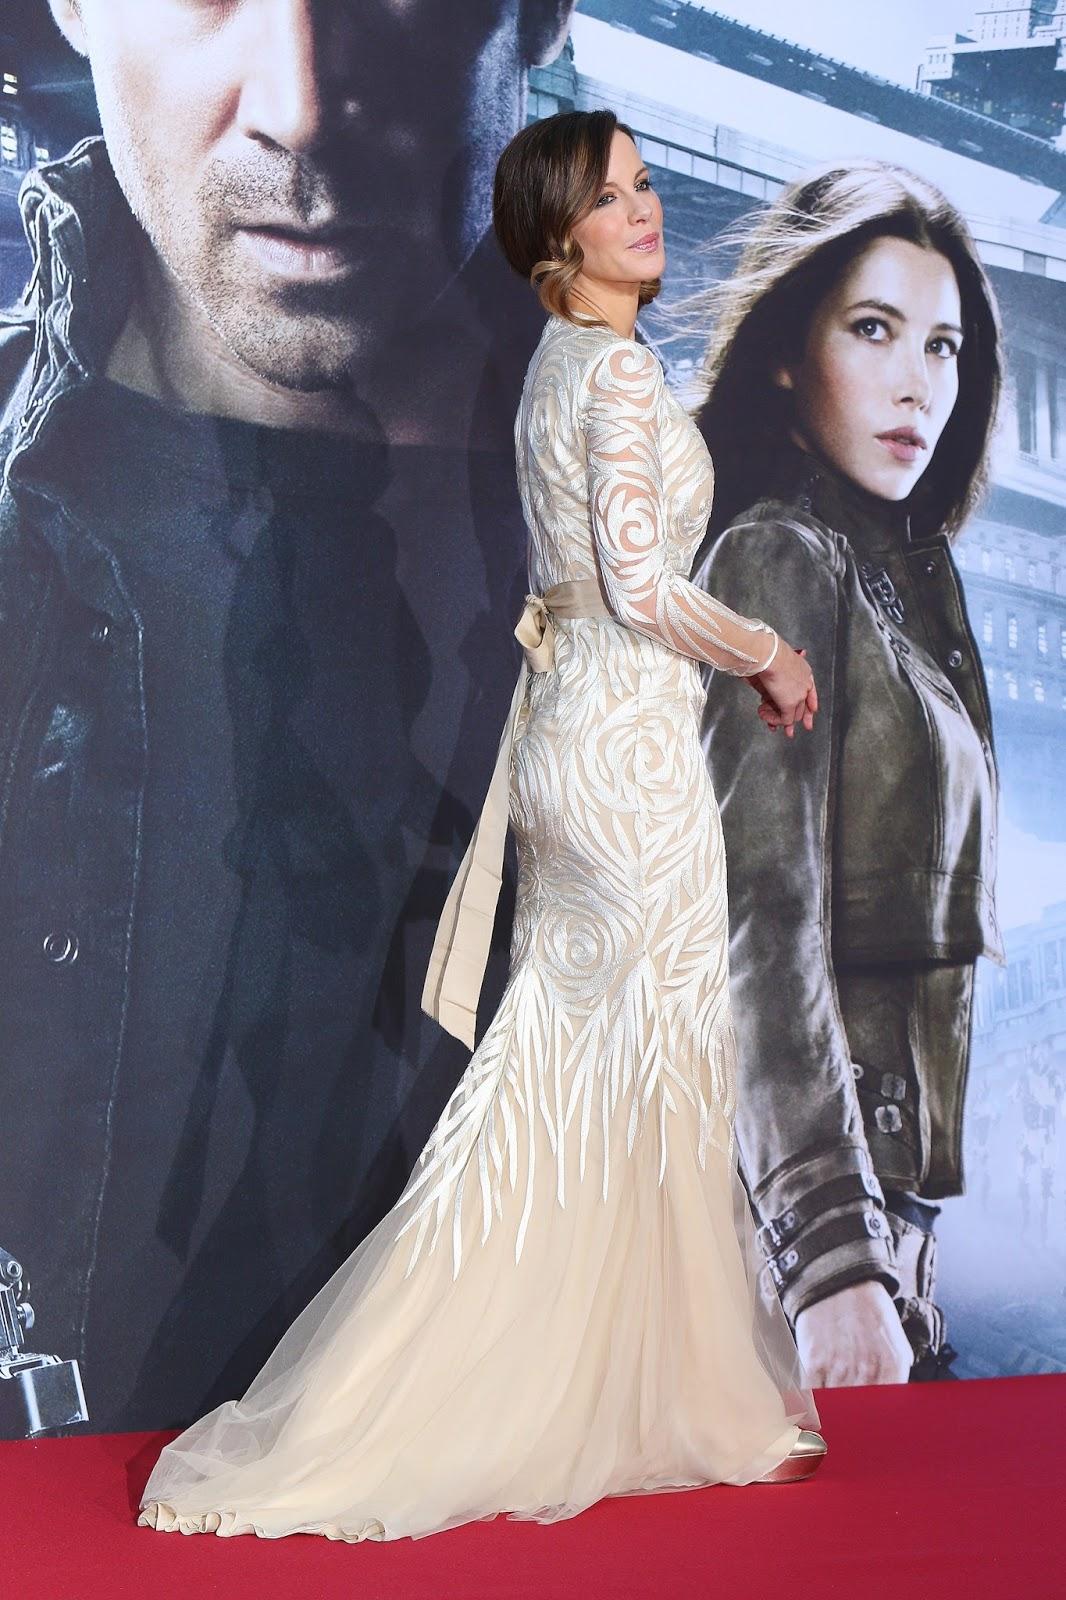 Underworld - Next Generation actress Kate Beckinsale Full HD Photos & Wallpapers